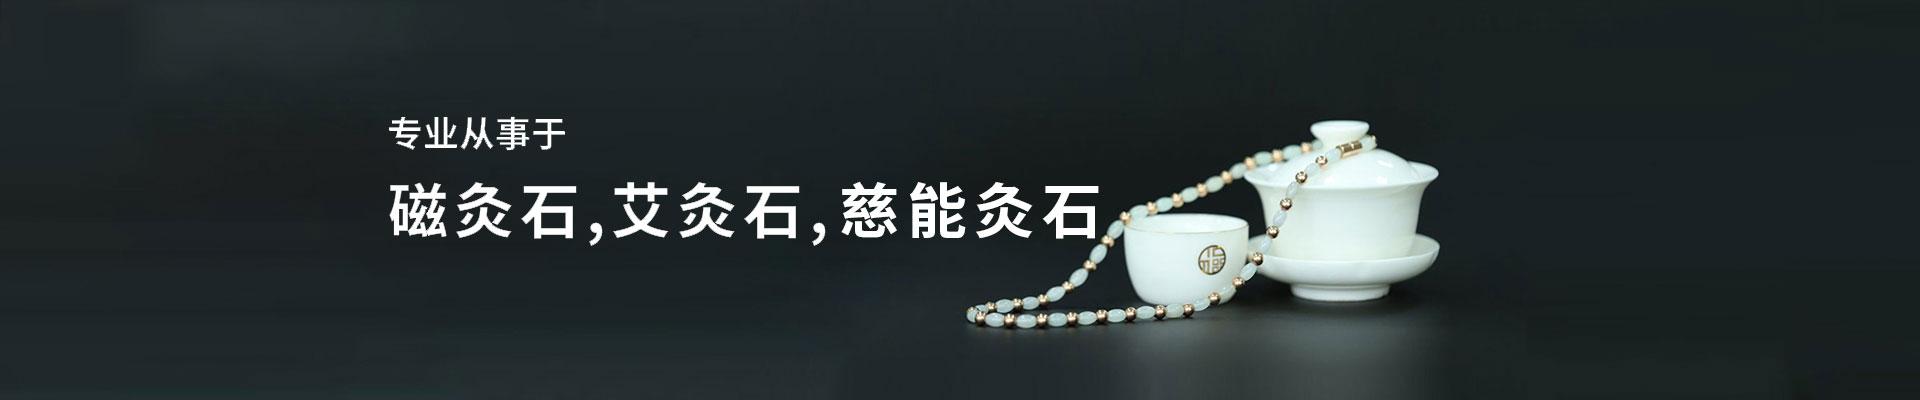 http://www.nbguorui.com/data/upload/202012/20201211090947_480.jpg